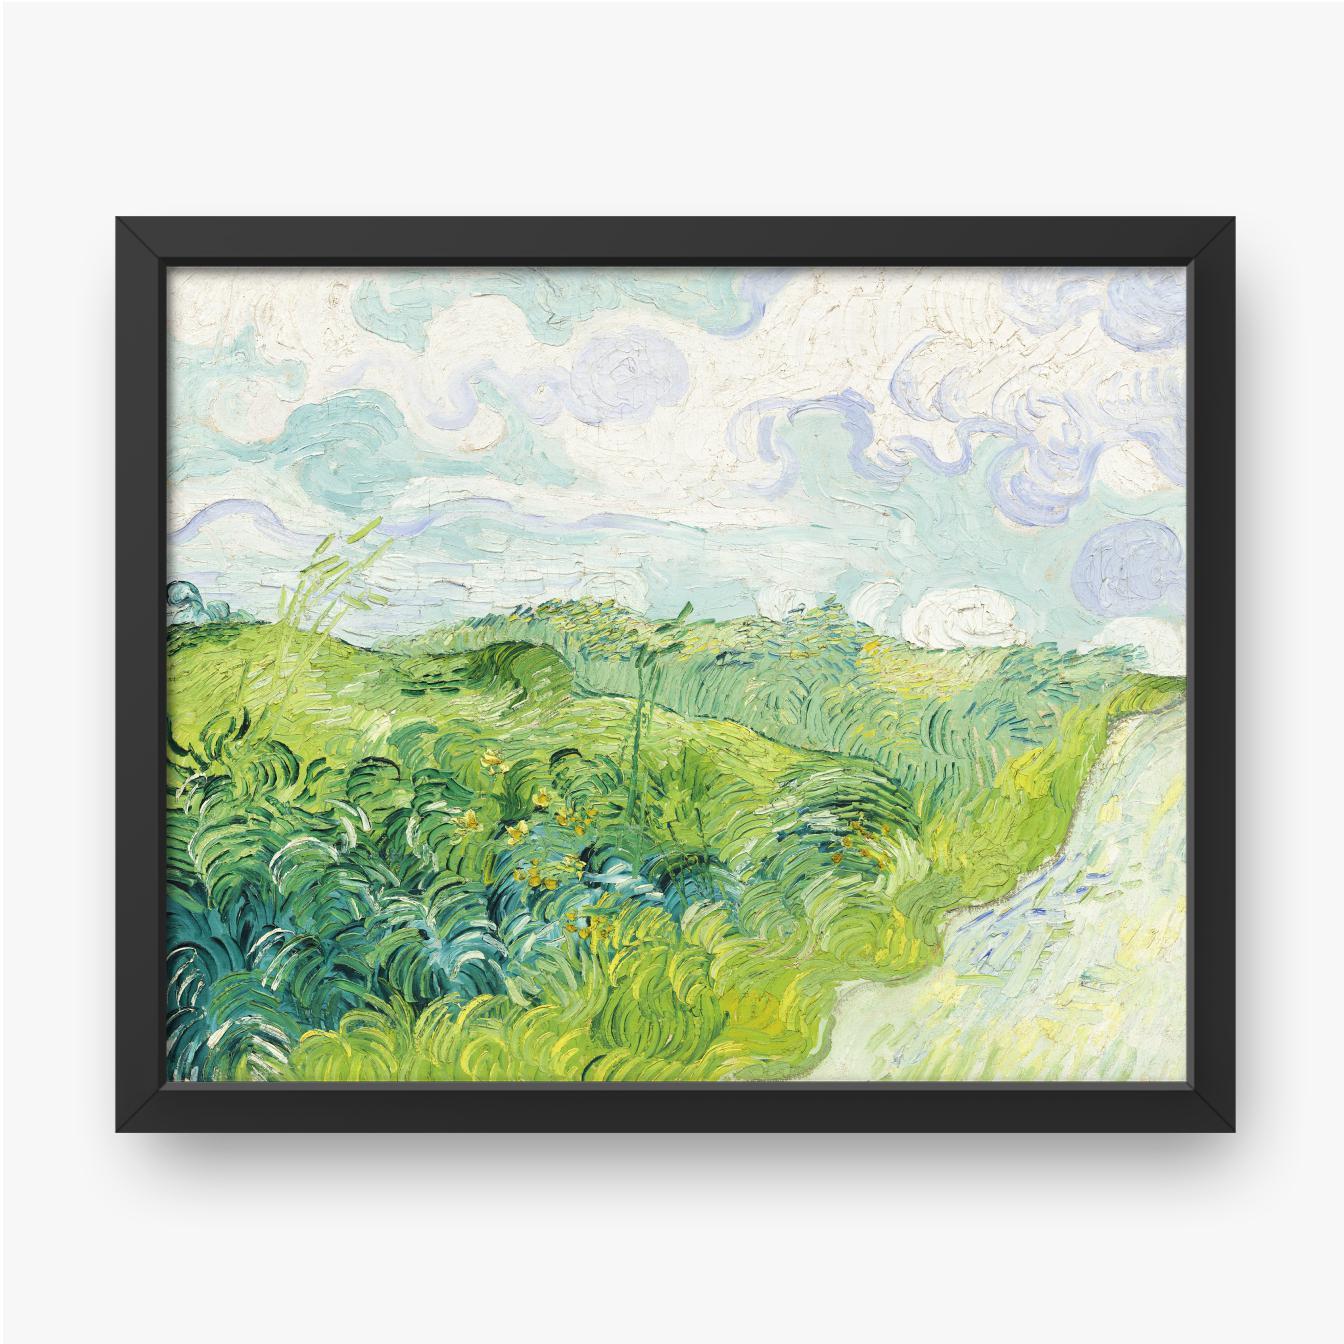 Vincent van Gogh, Zielone pola pszenicy, Auvers, 1890